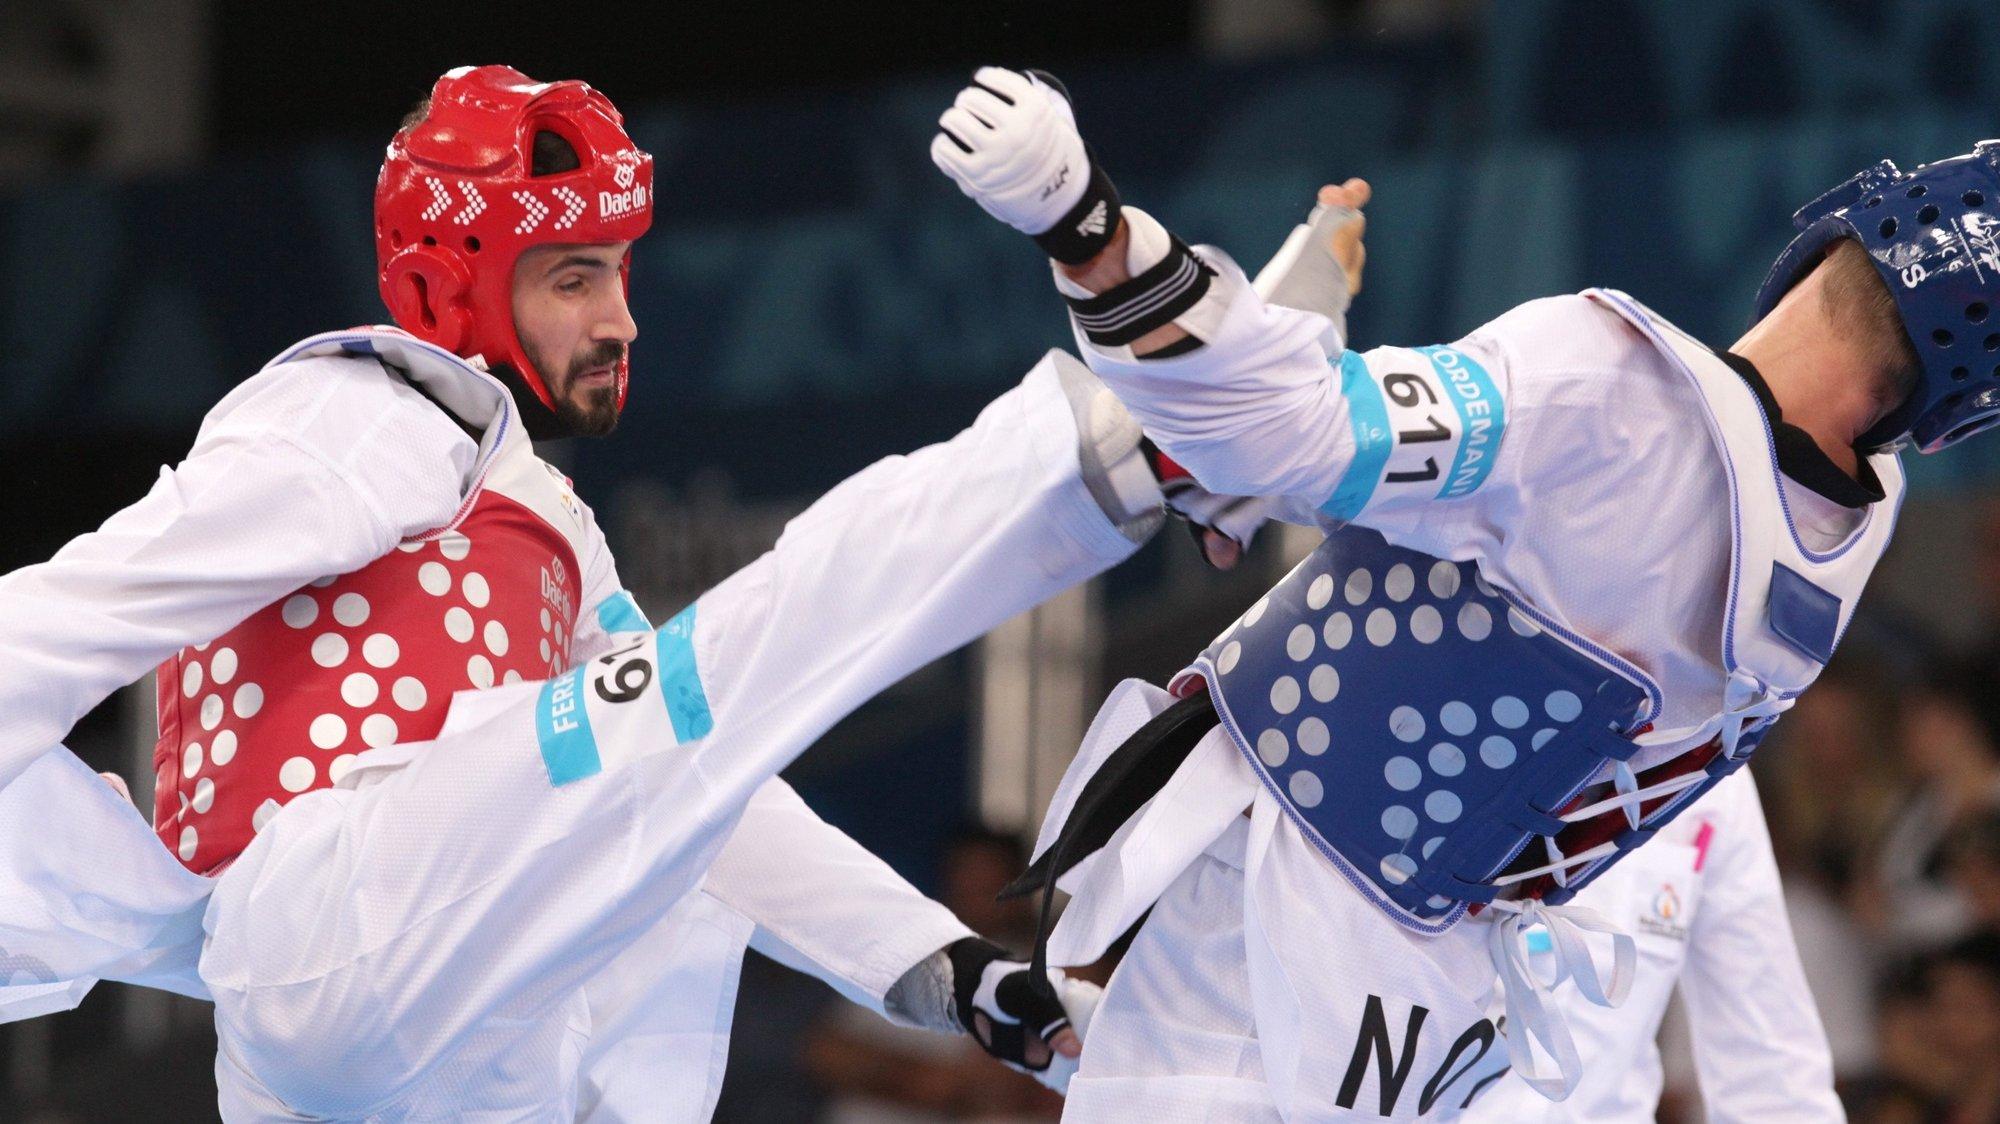 epa04807407 Richard Ordemann of Norway (blue) fights against Julio Ferreira of Portugal(red) during their - 80kg men's Taekwondo bronze medal final bout at the Baku 2015 European Games in Baku, Azerbaijan, 18 June 2015.  EPA/ZURAB KURTSIKIDZE